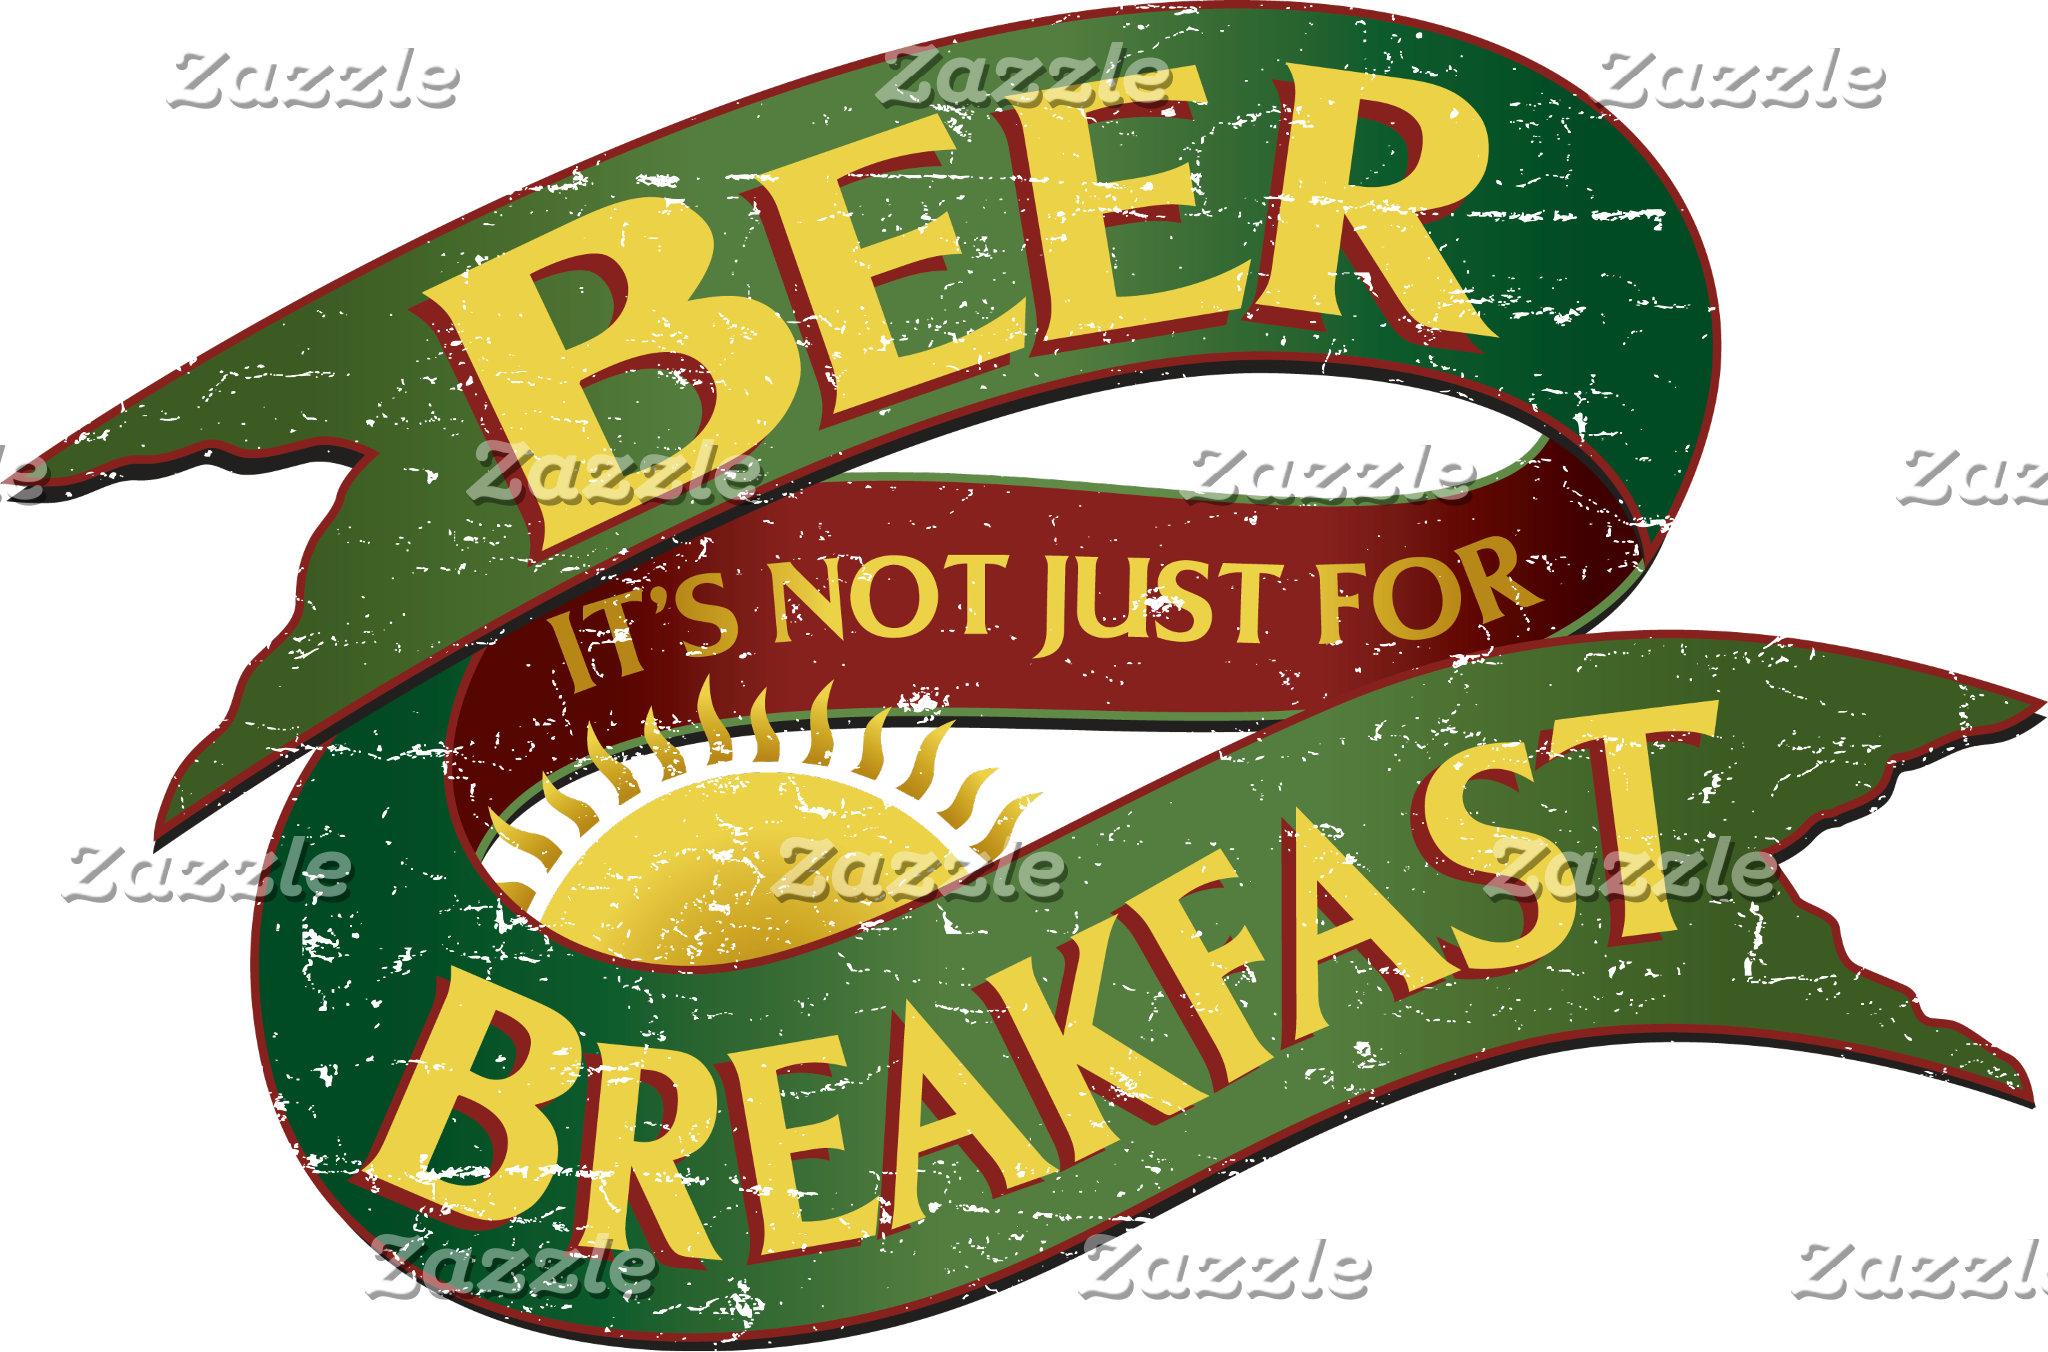 Beer It's Not Just for Breakfast